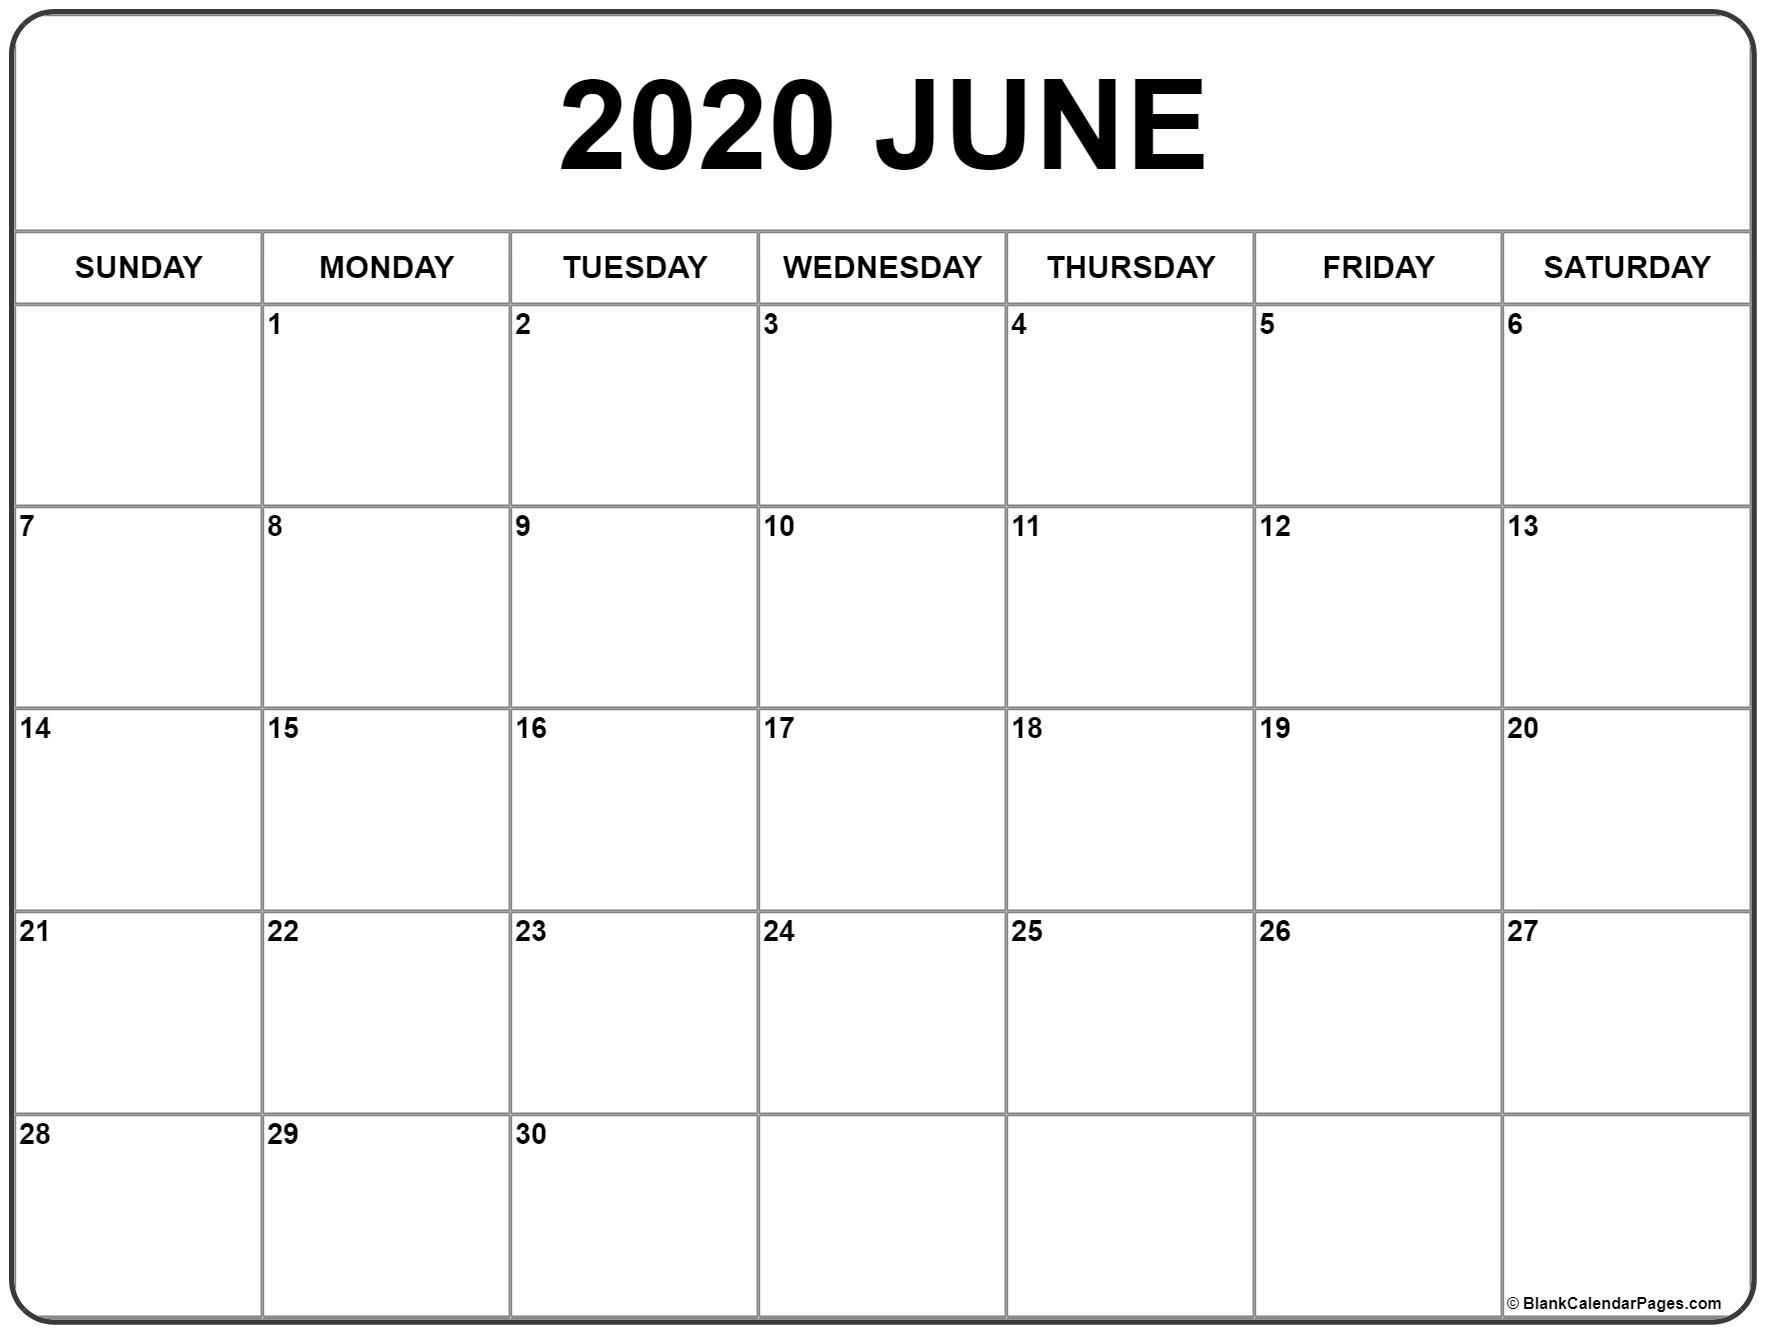 June 2020 Calendar | Free Printable Monthly Calendars within Printable Yearly Calendar June 2019-2020